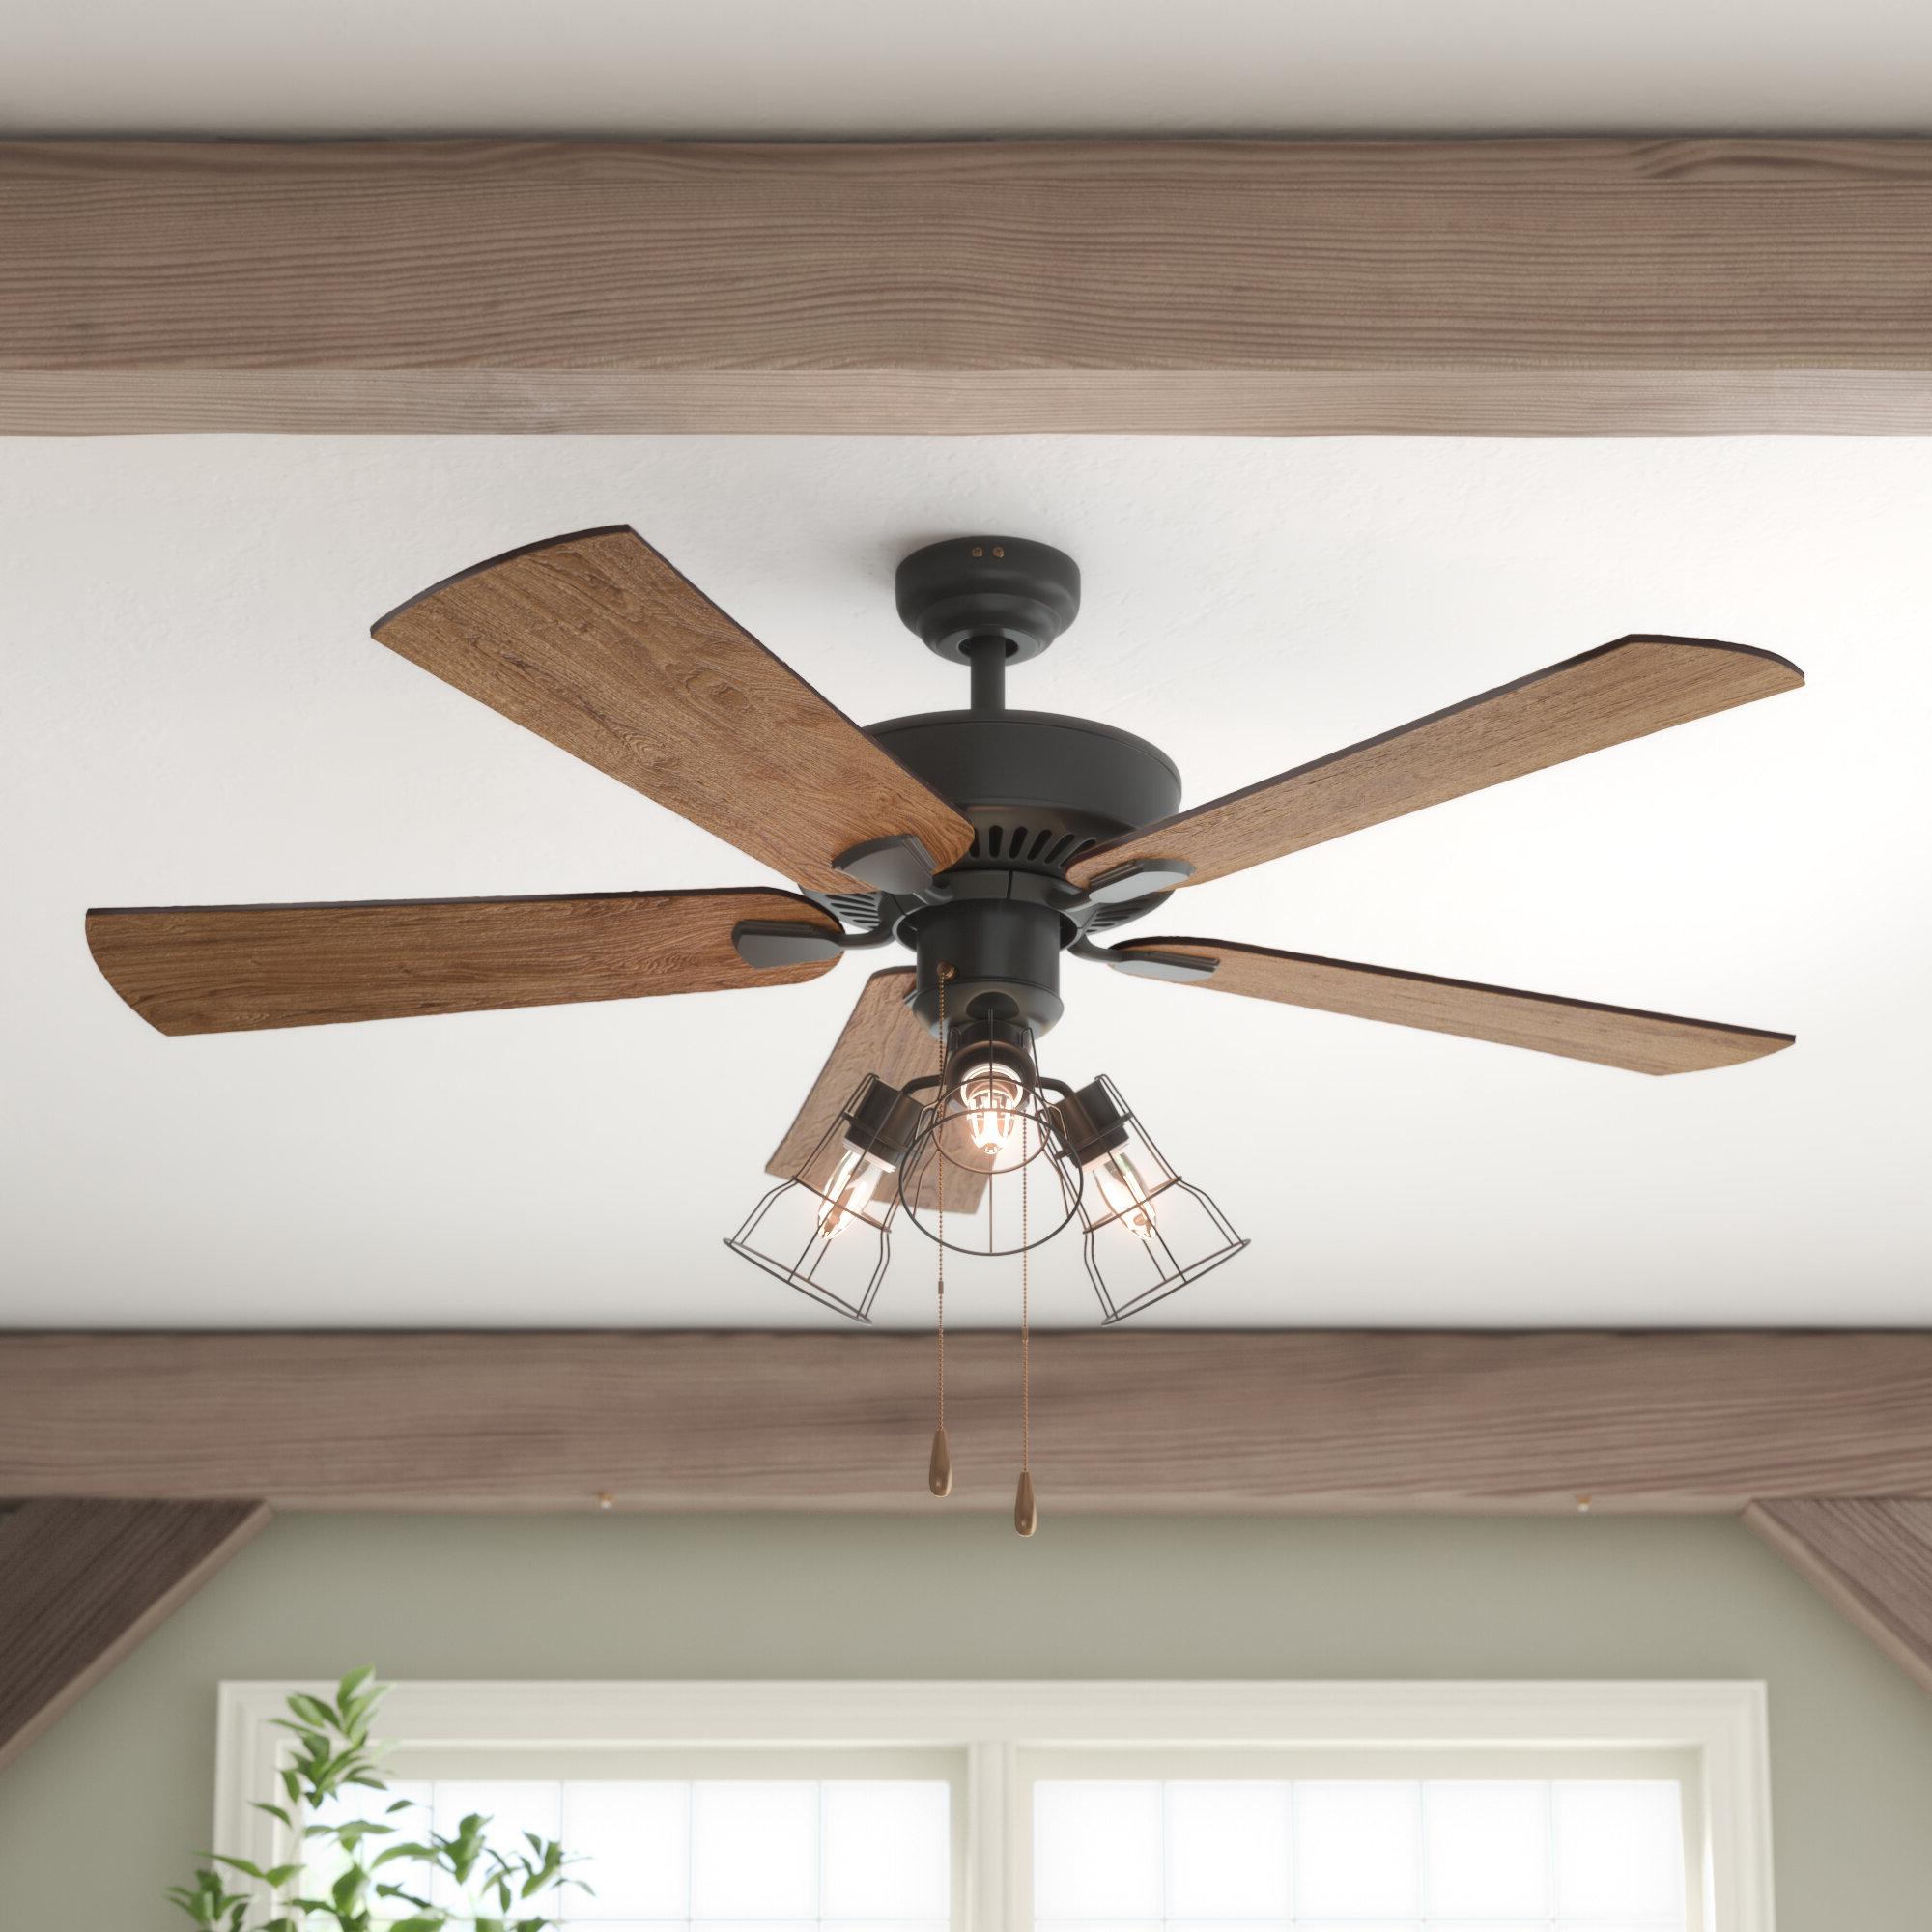 "52"" Socorro 5 Blade Led Ceiling Fan, Light Kit Included Intended For Popular Ravello 5 Blade Led Ceiling Fans (View 8 of 20)"